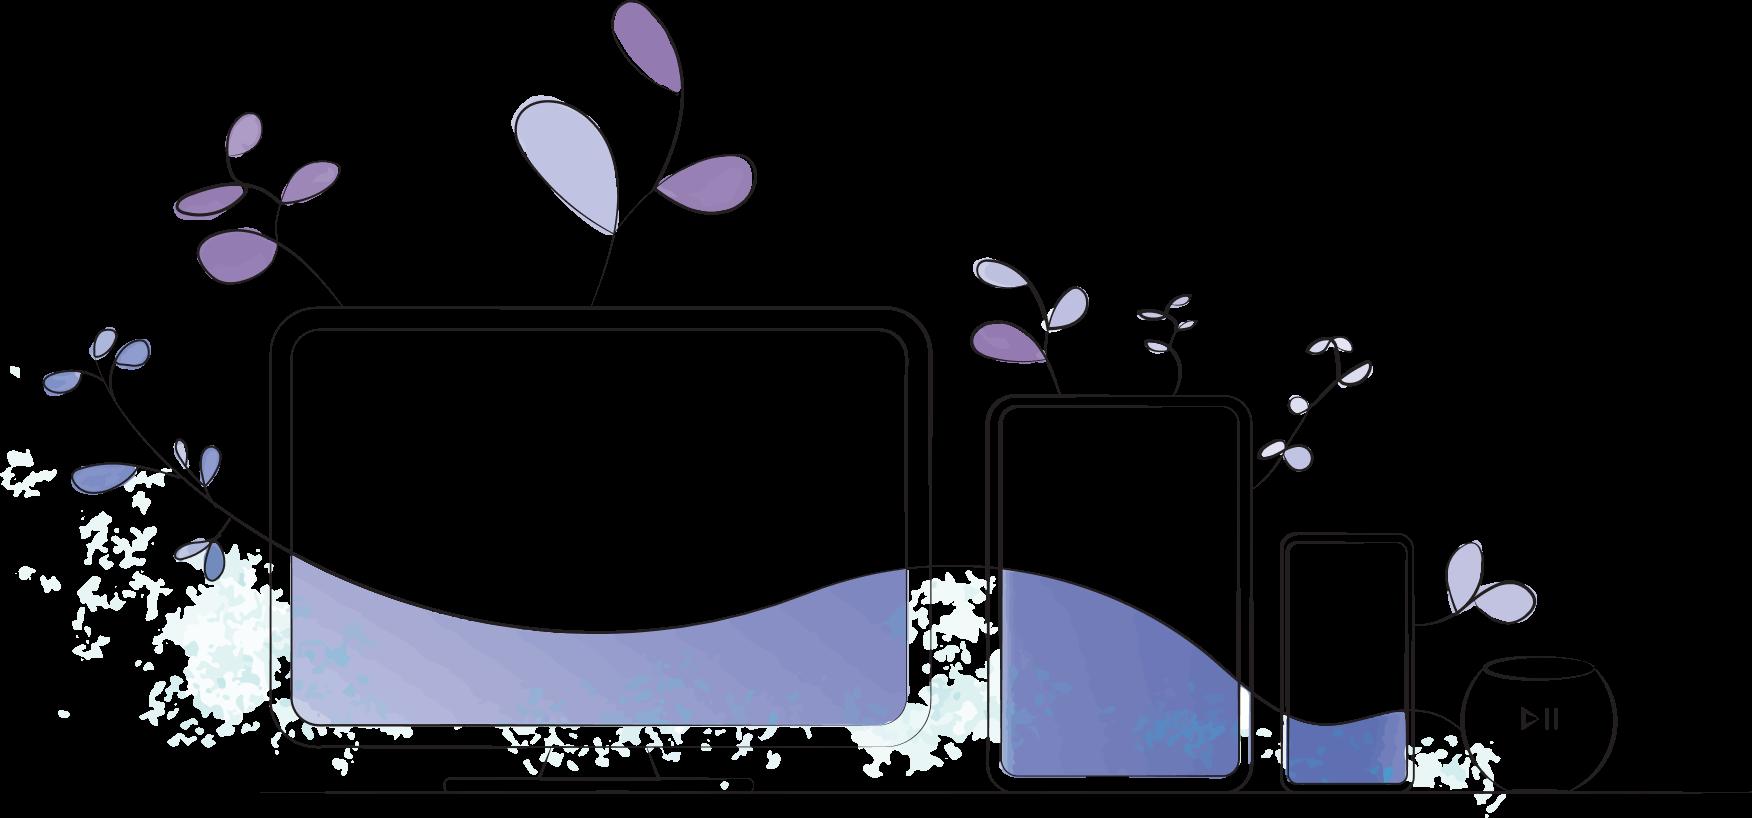 Desktop screen, tablet screen, mobile phone screen and smart speaker.